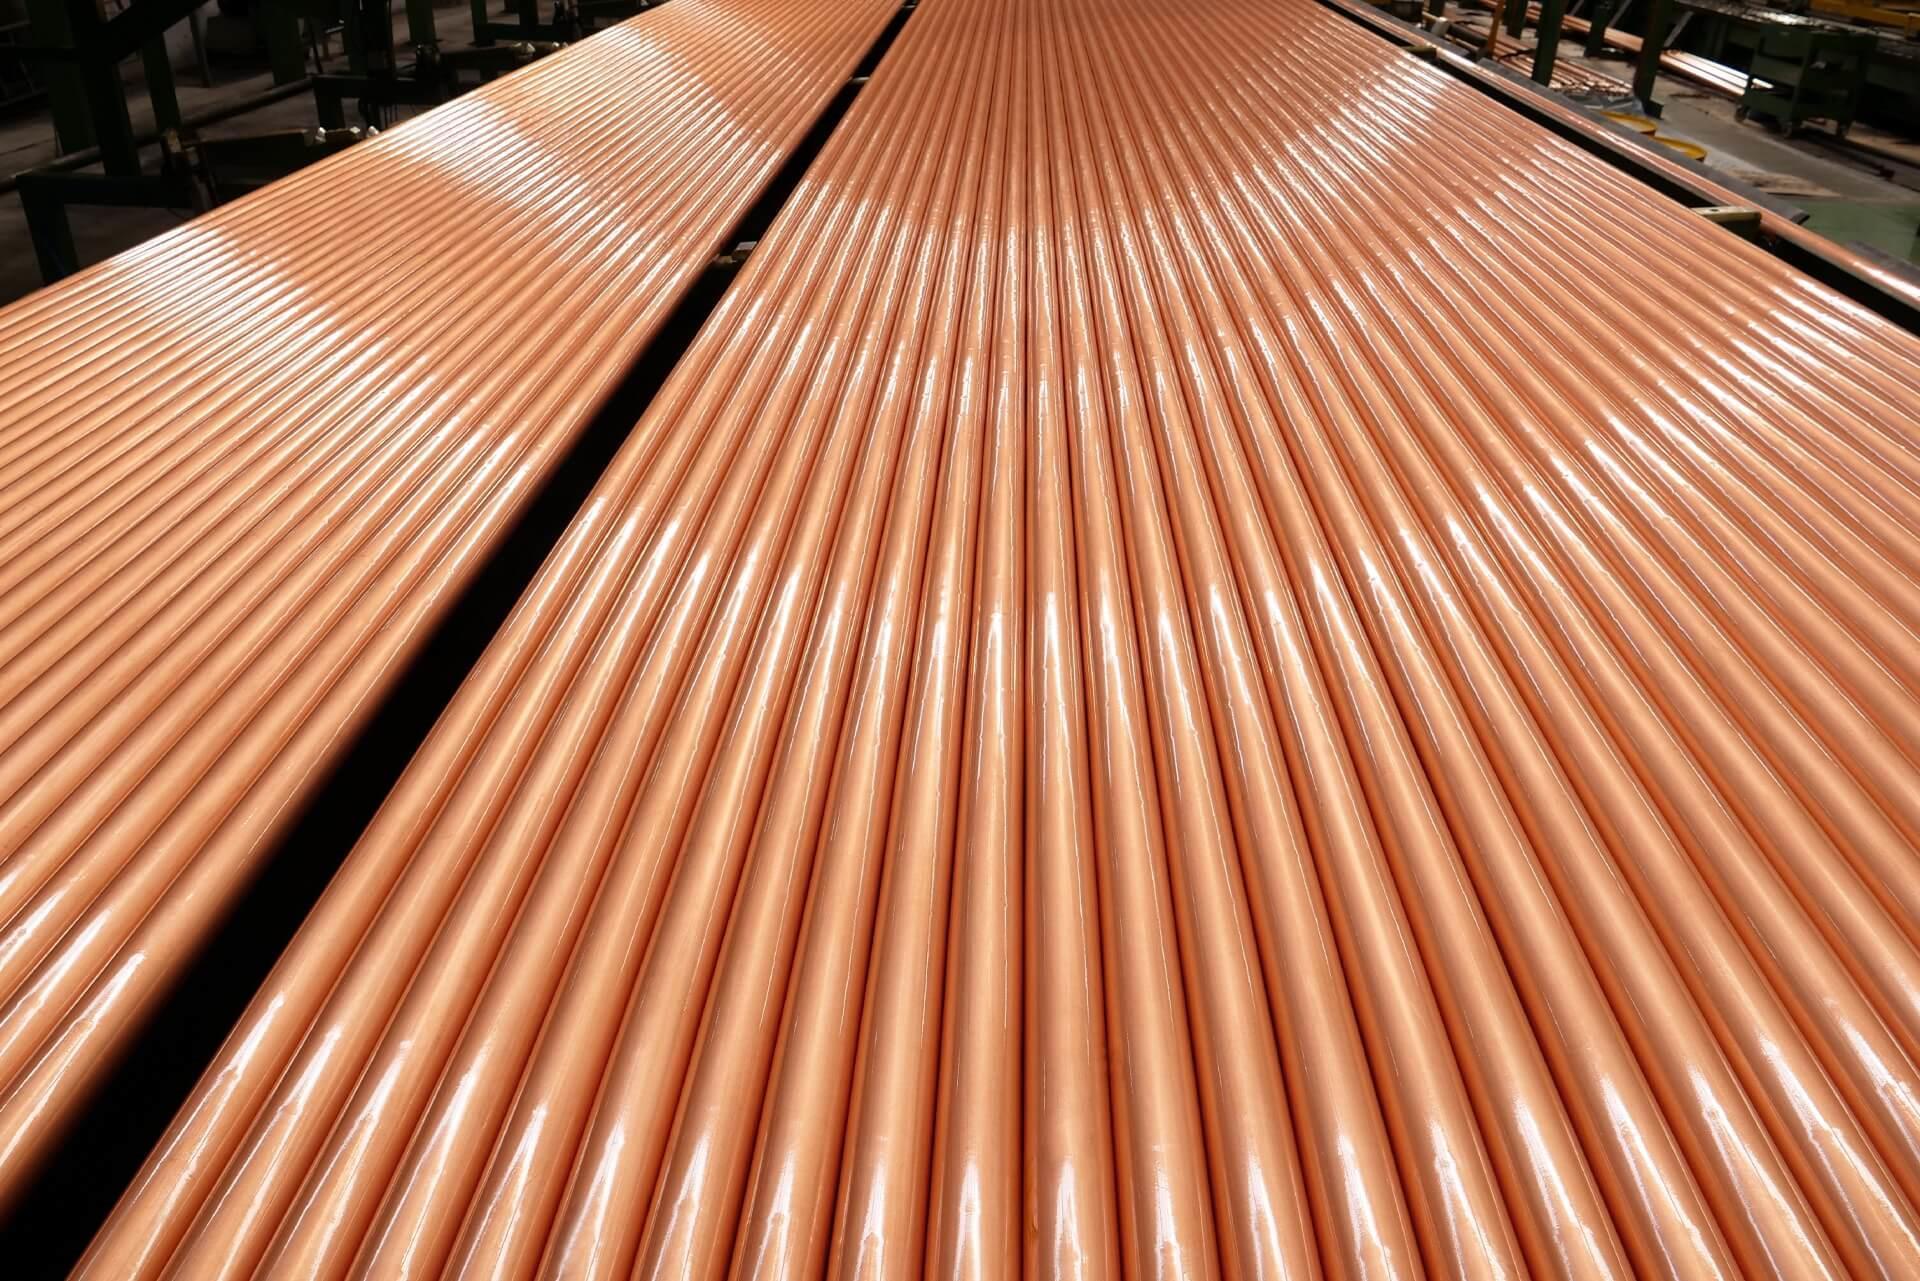 Halcor, Europe's largest copper tubes producer